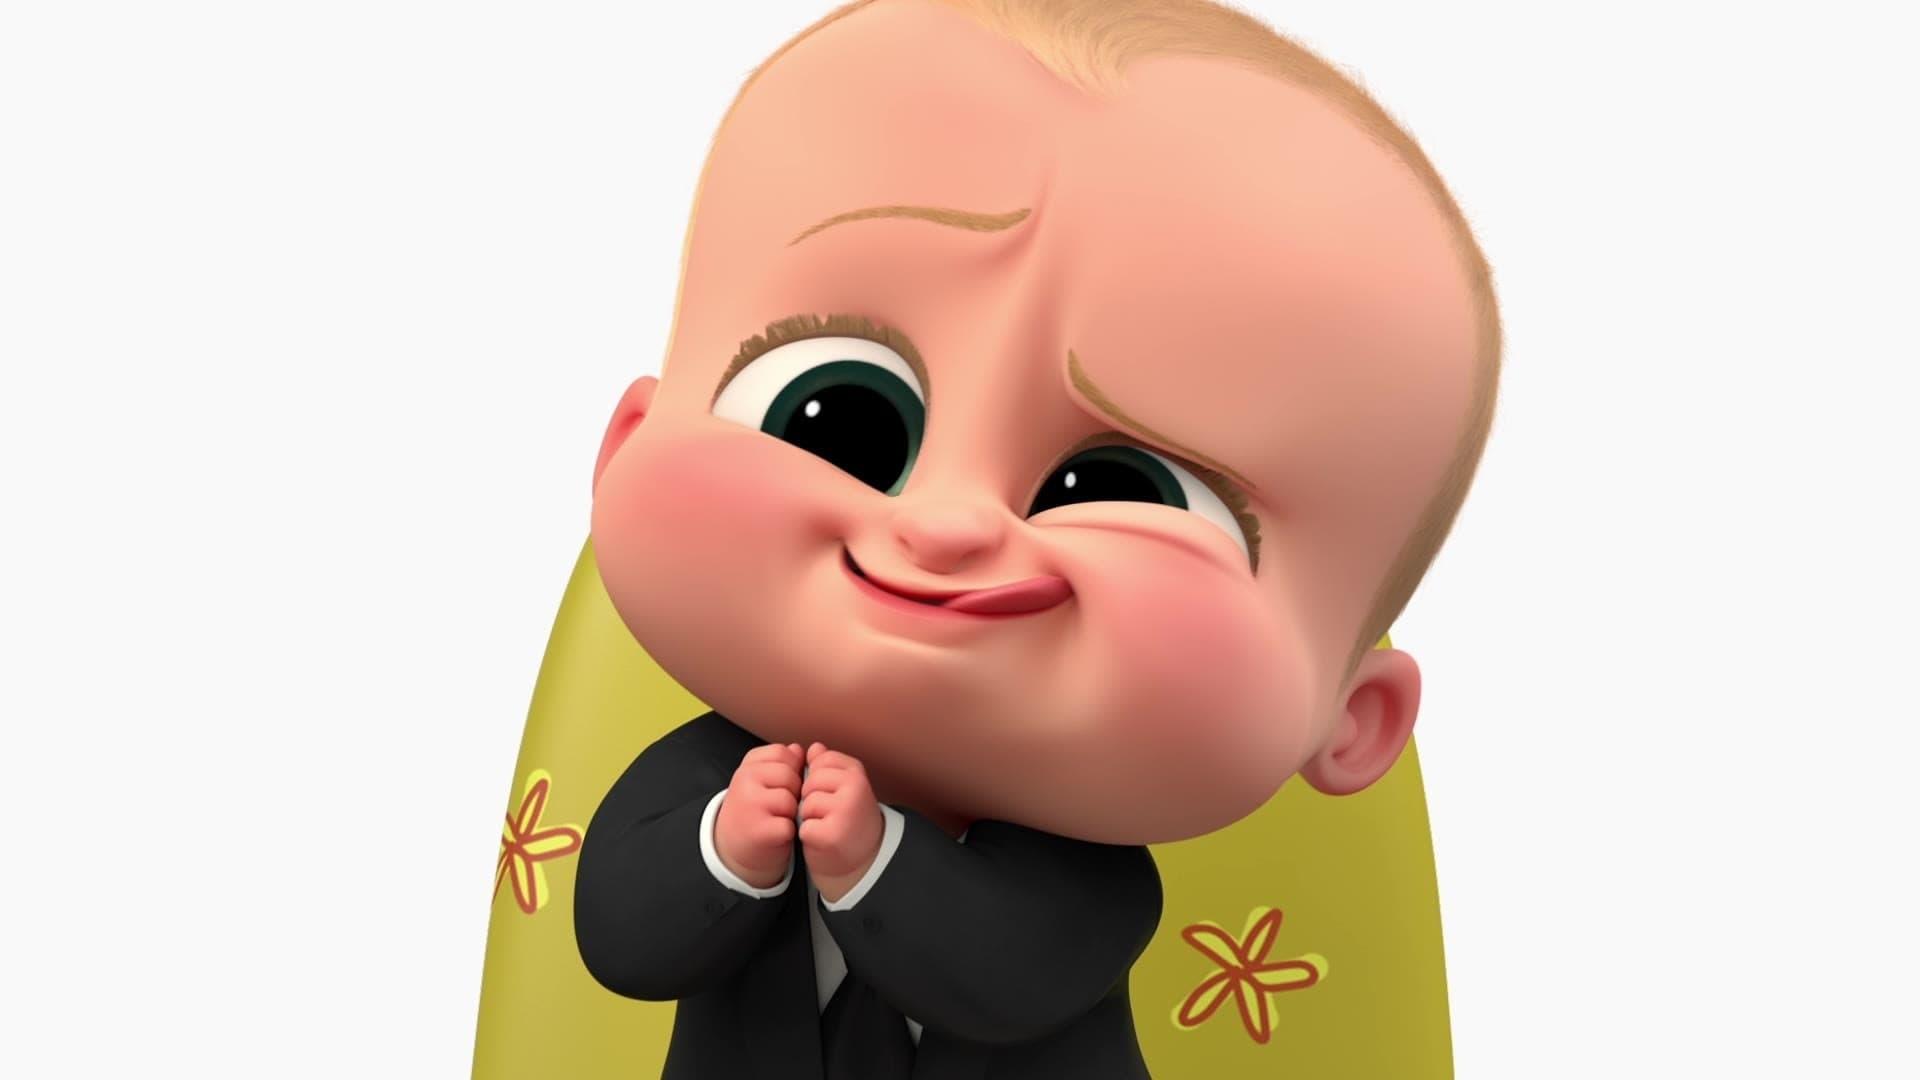 Watch The Boss Baby Free Movie Watch Online - GoMovies.Tel